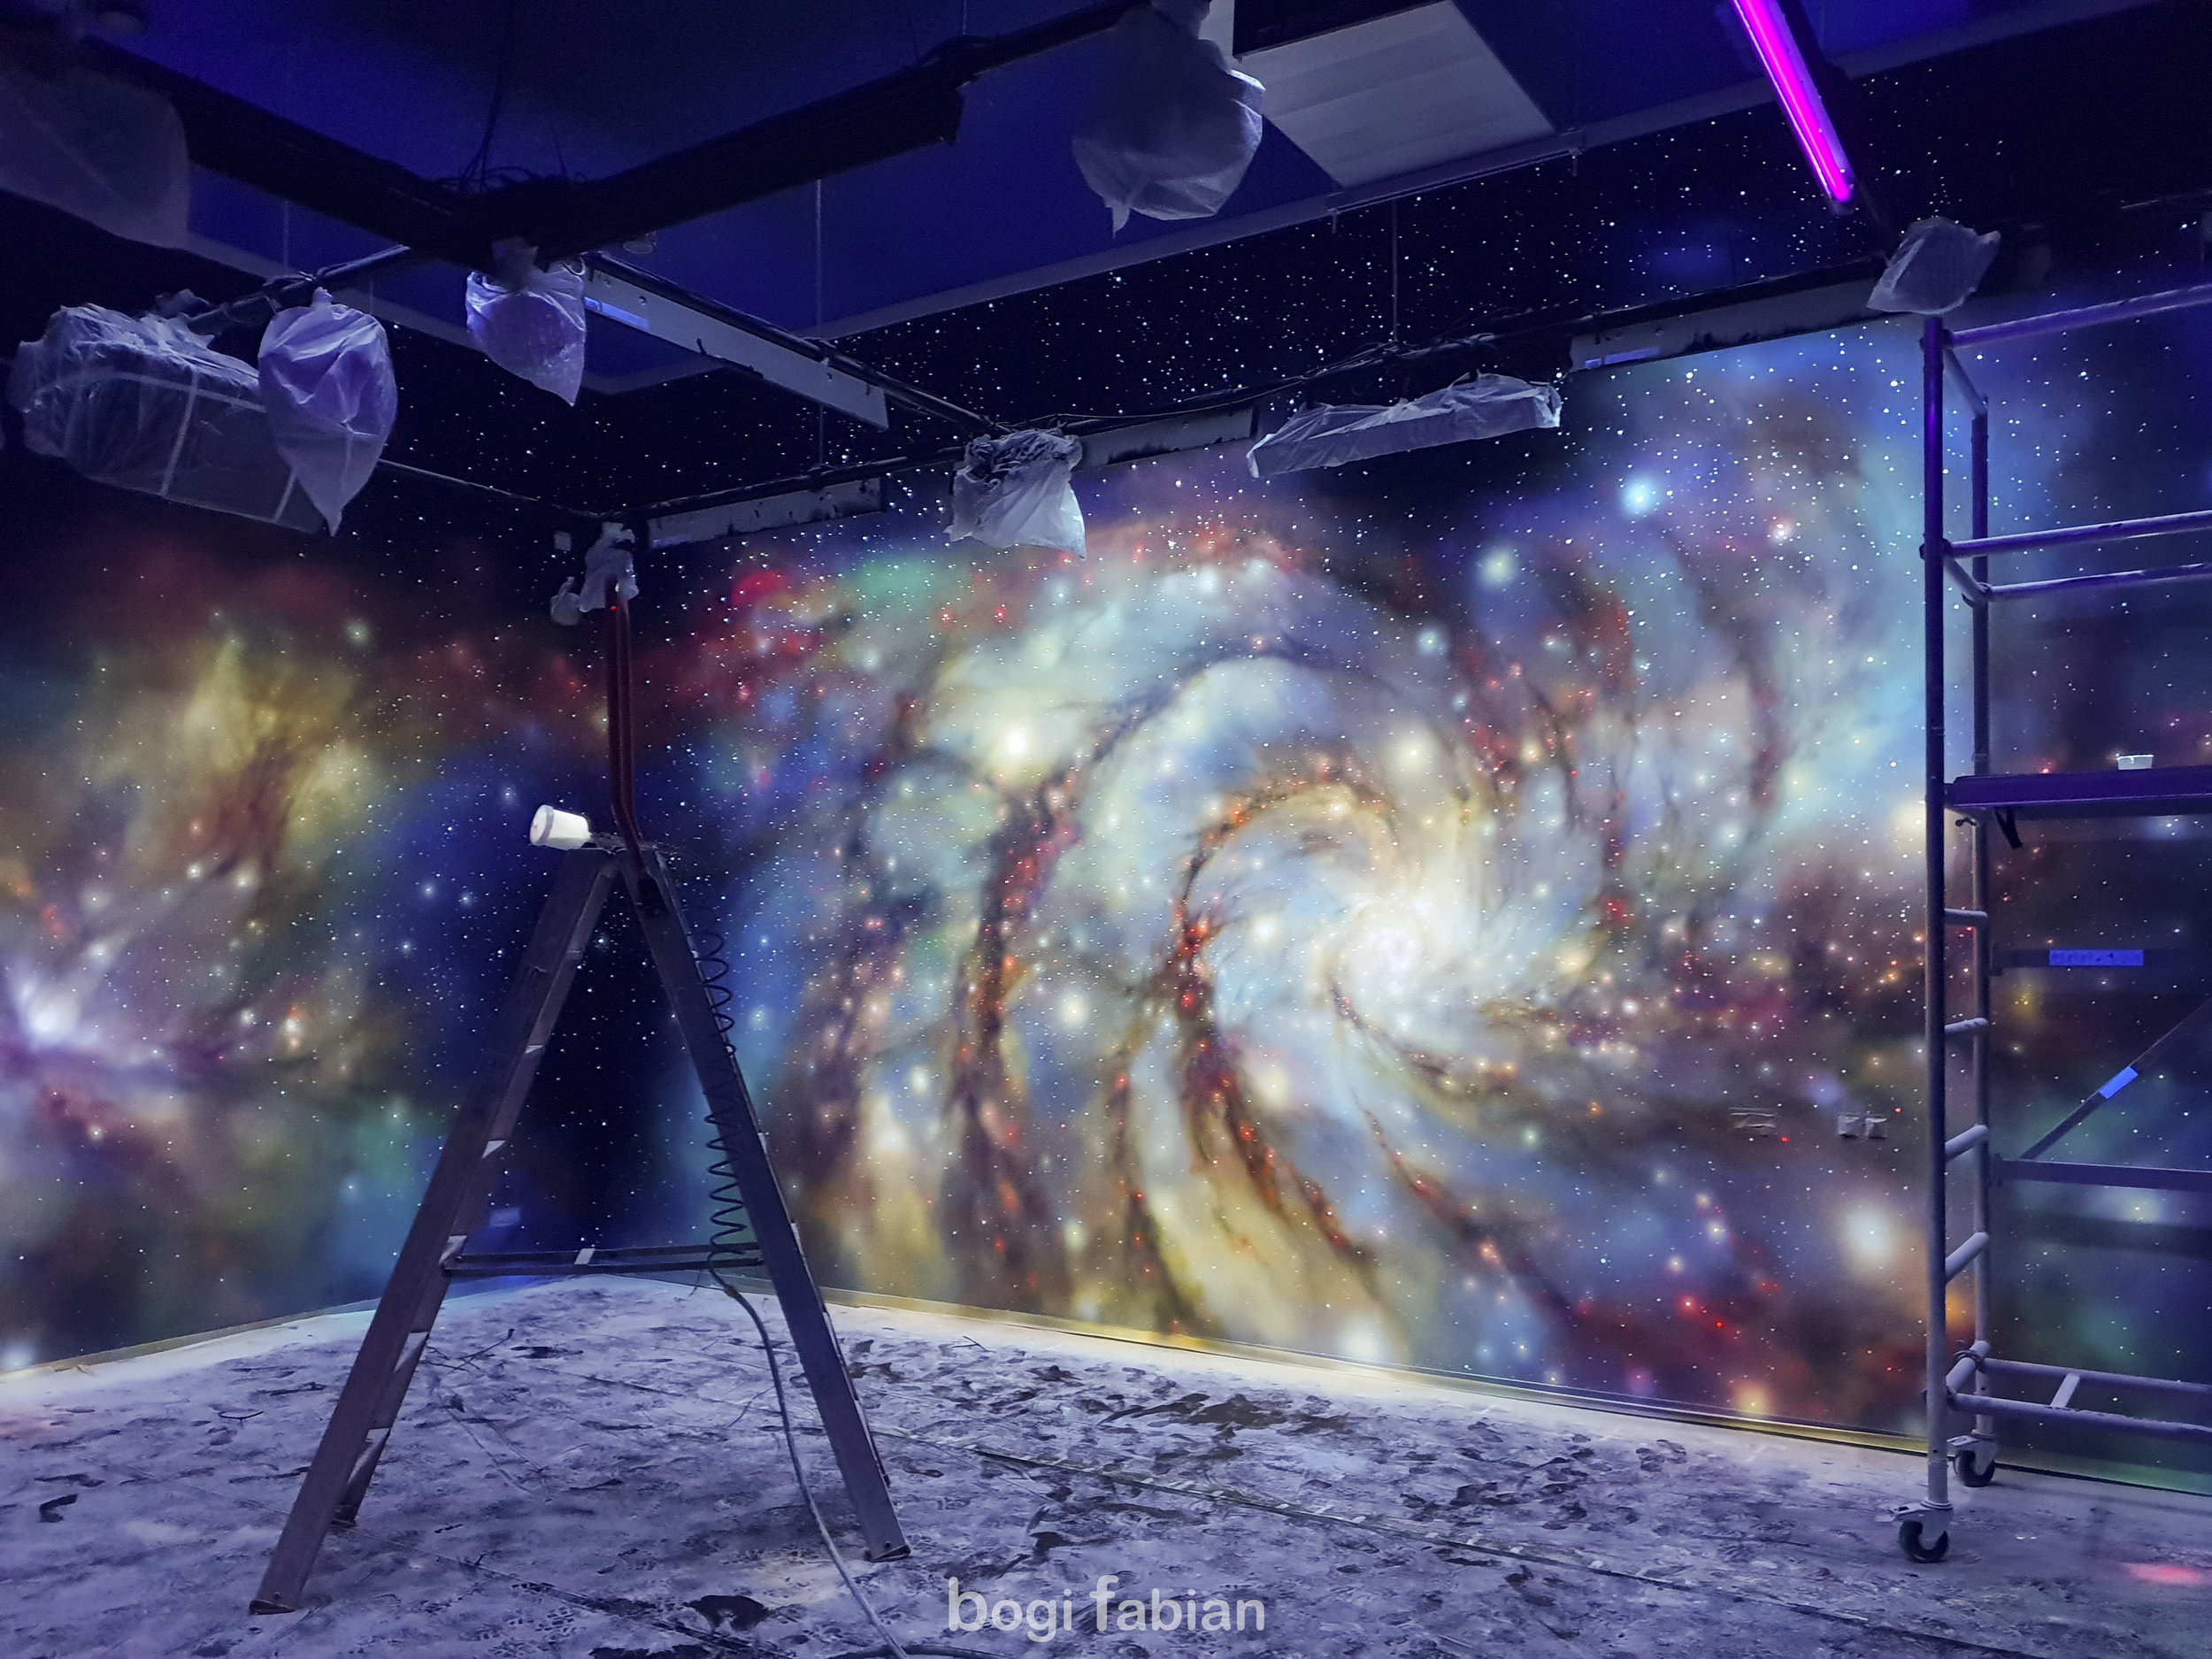 Bogi Fabian Glowing mural Ultraviolet Blacklight Art Universum Galaxy interior design Glowinthedark